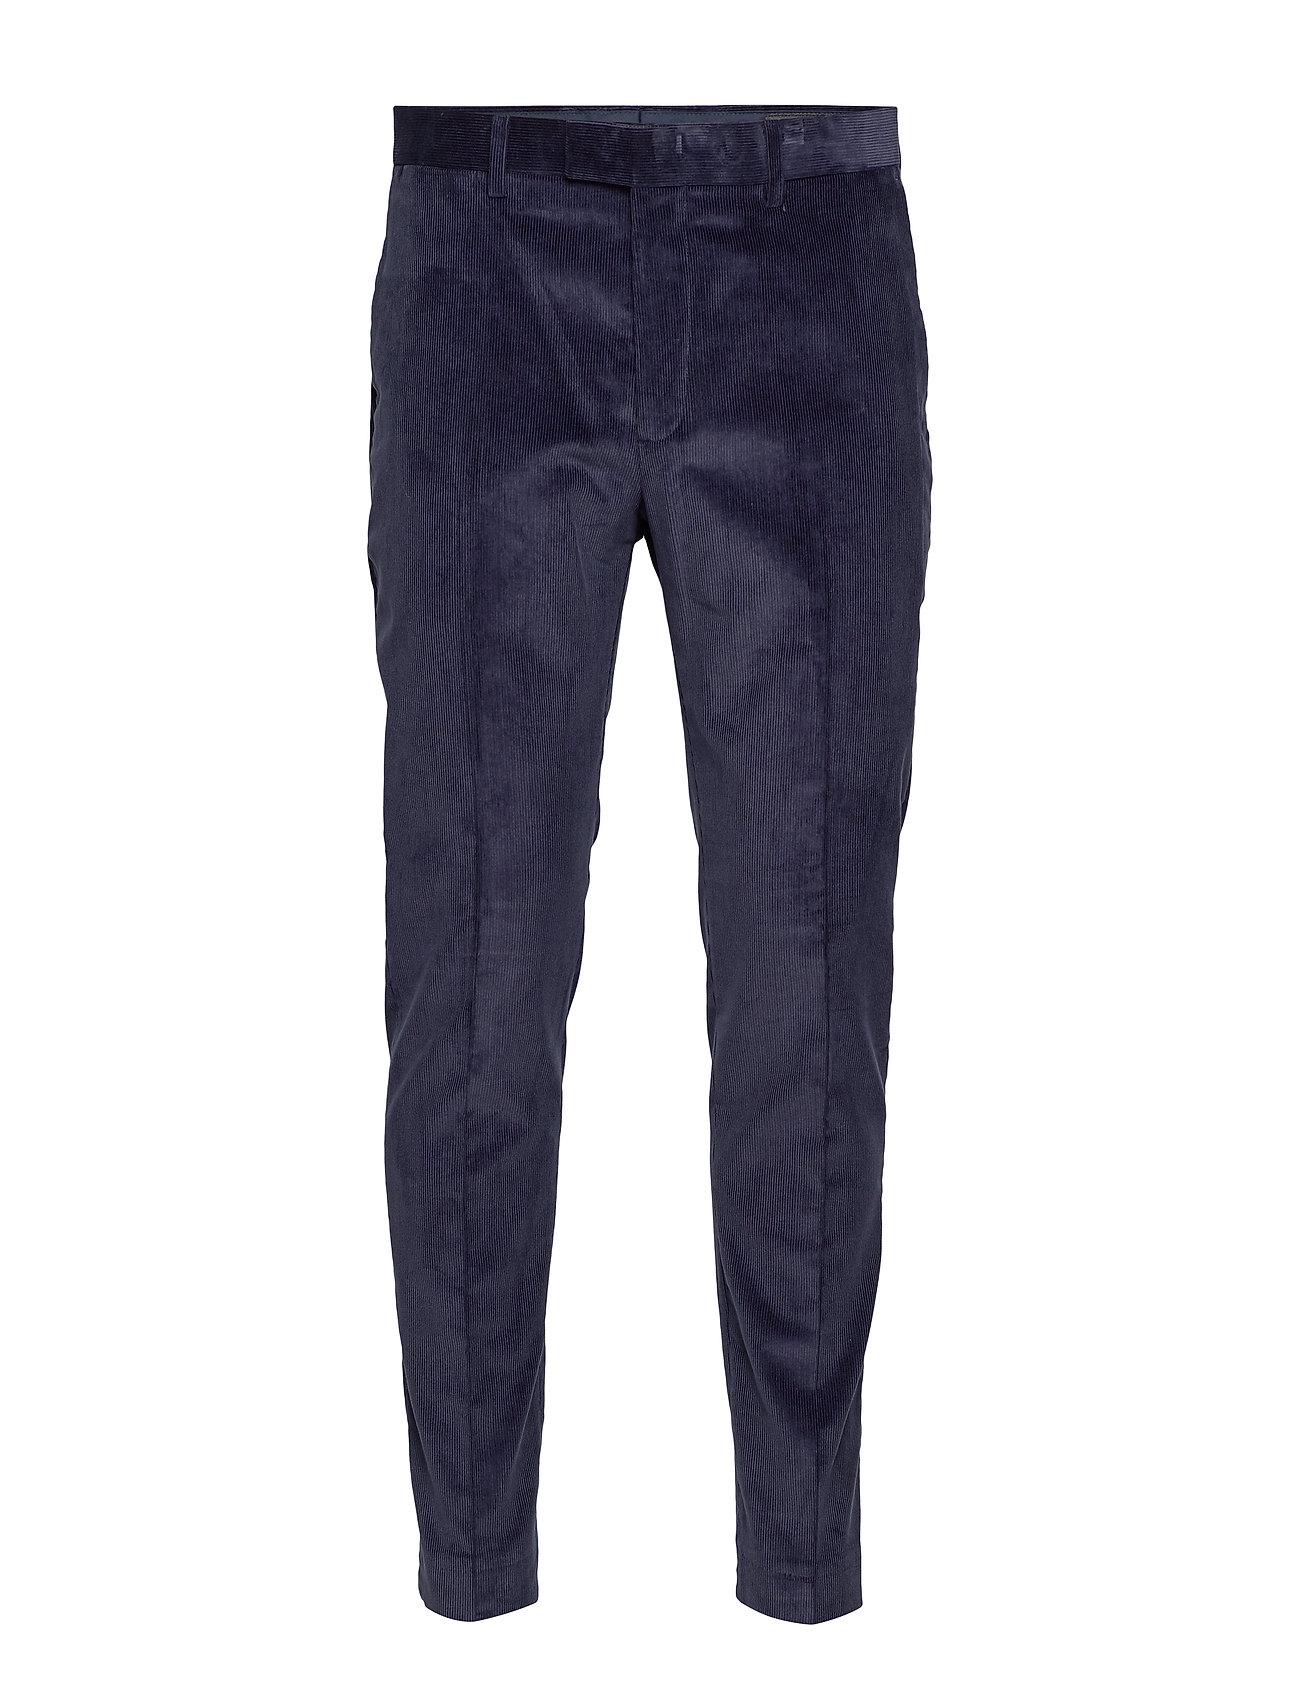 Banana Republic Slim Tapered Italian Corduroy Suit Pant - NAVY